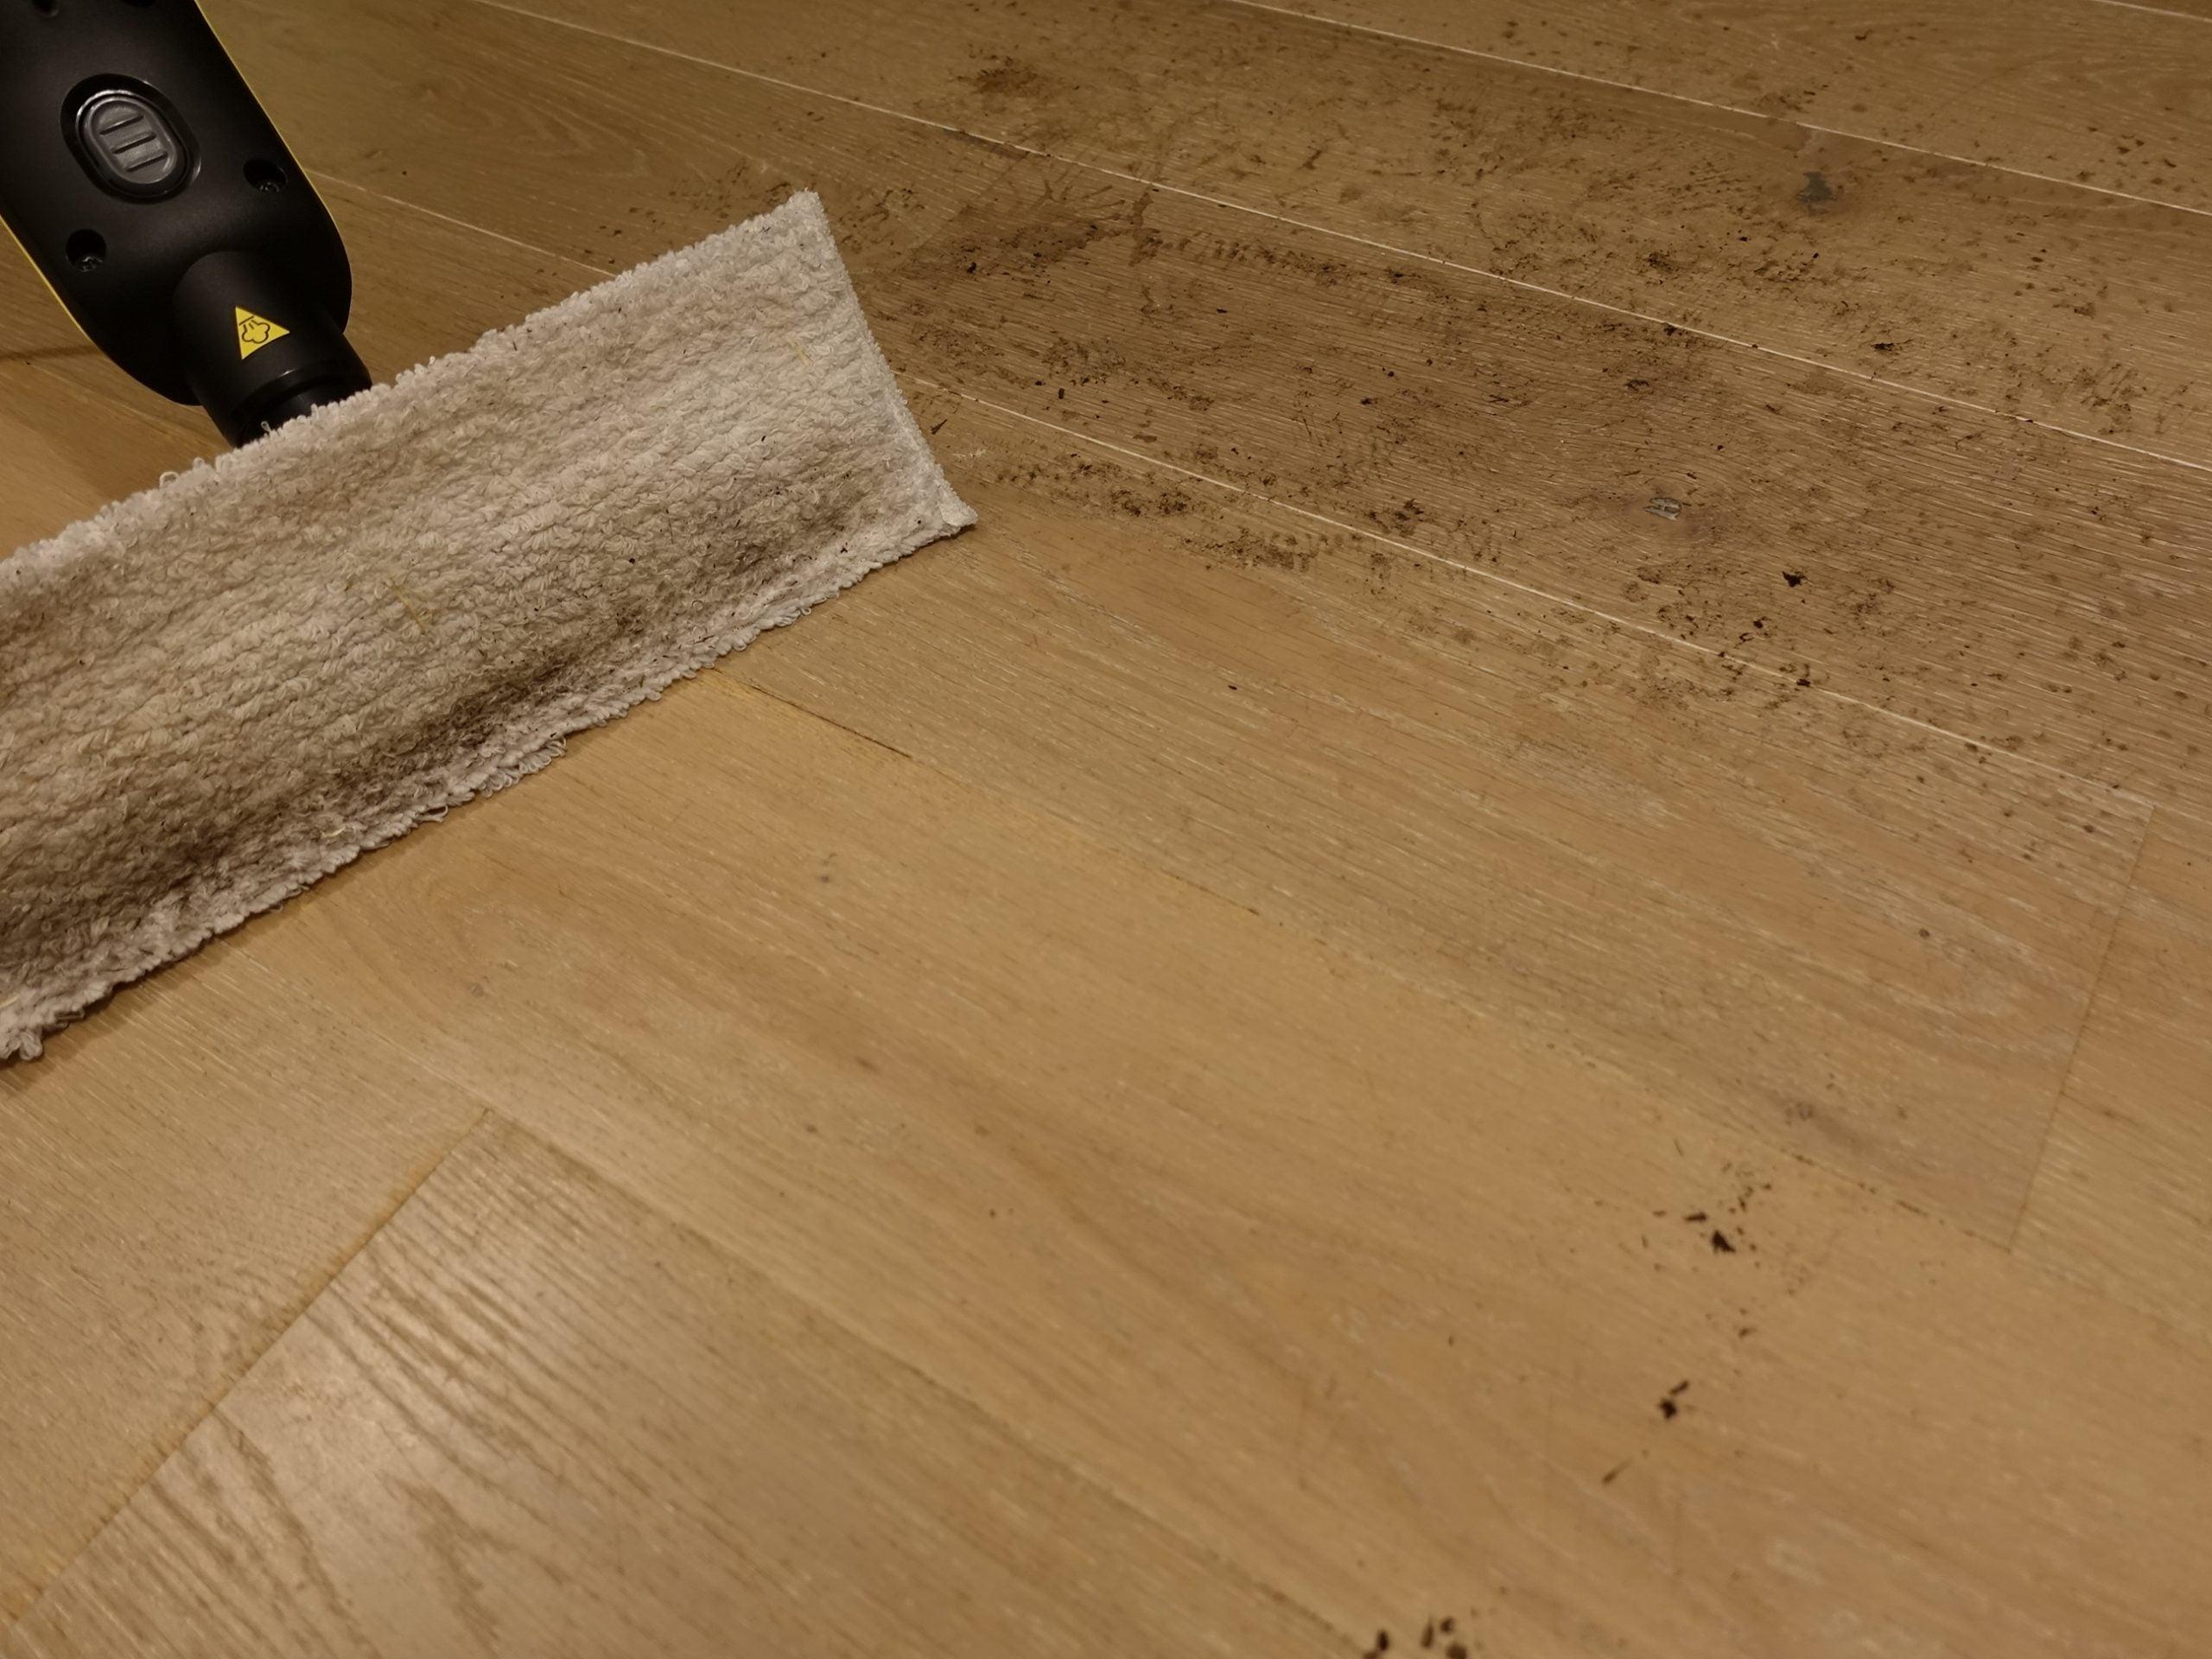 Karcher SC3 Upright EasyFix after cleaning